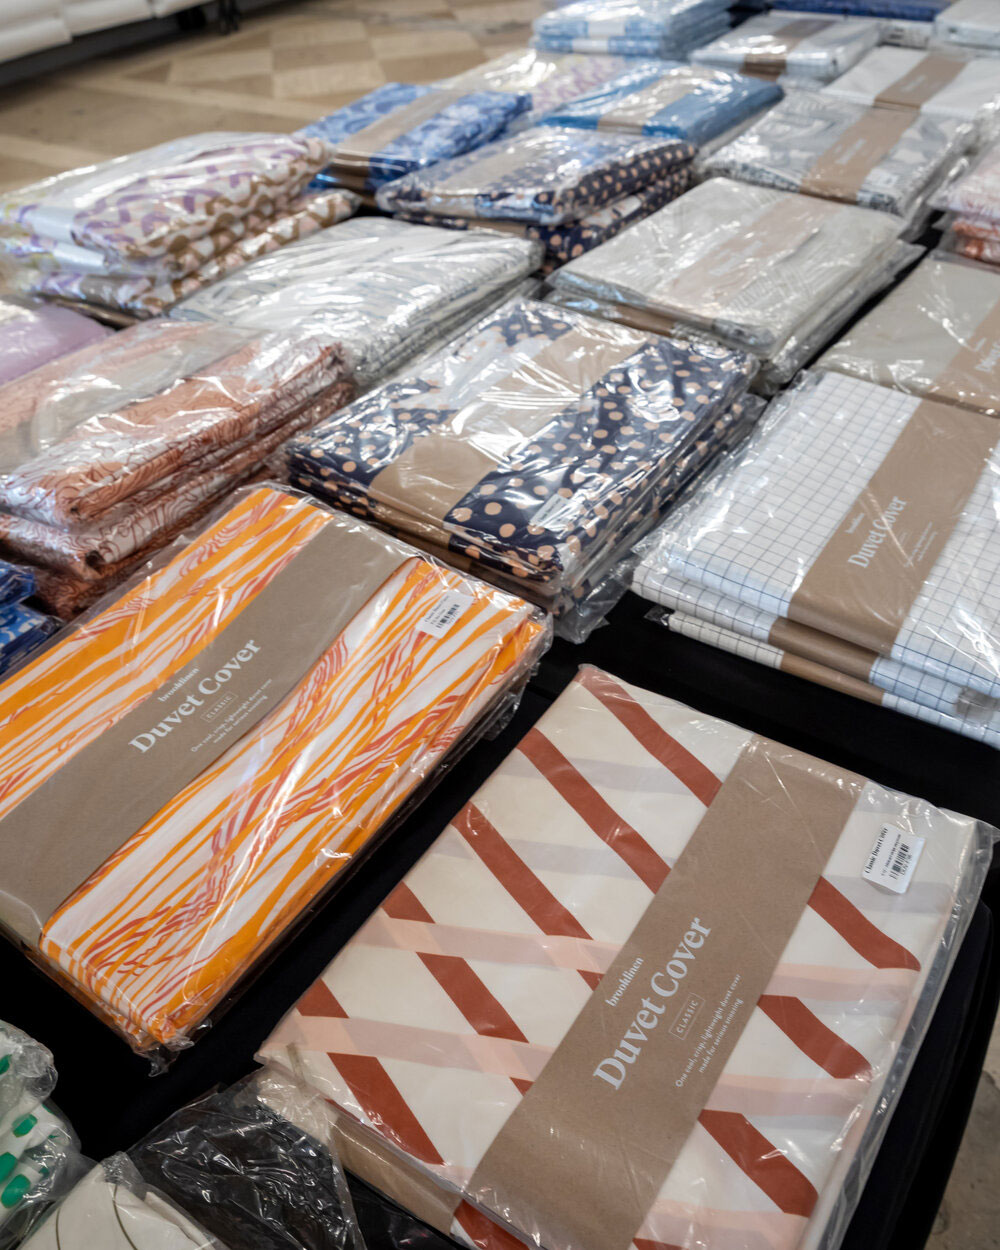 Brooklinen Sample Sale in Images